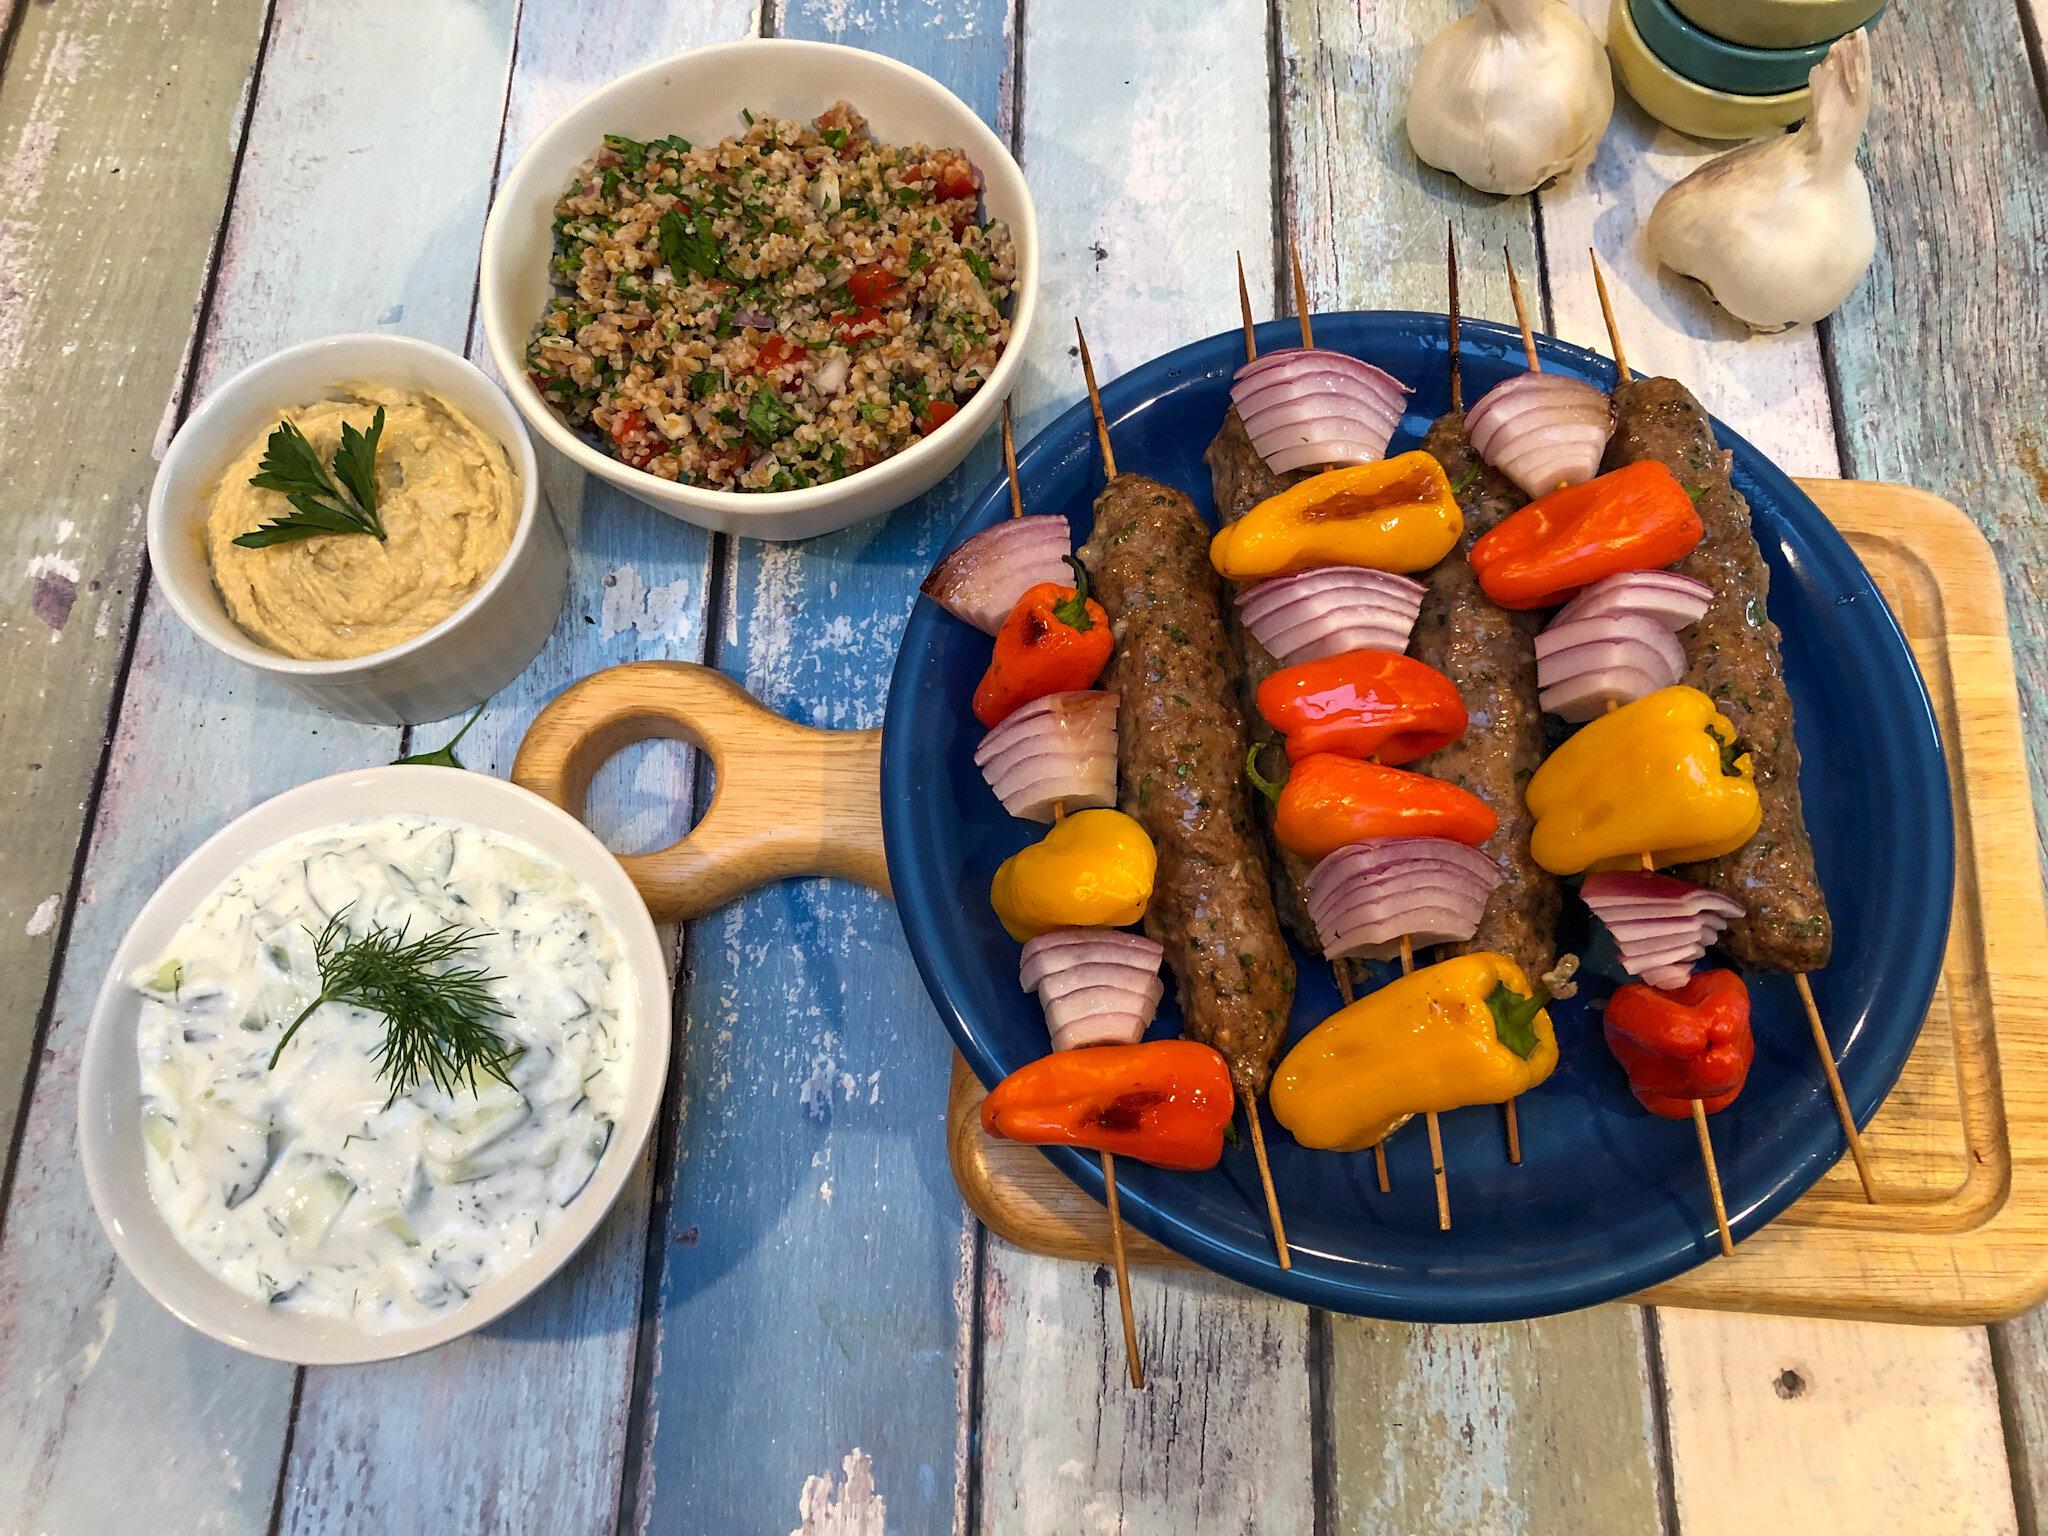 Mediterranean meal with Fat-Free Tzatziki, Hummus, Tabbouleh, an Kebabs.